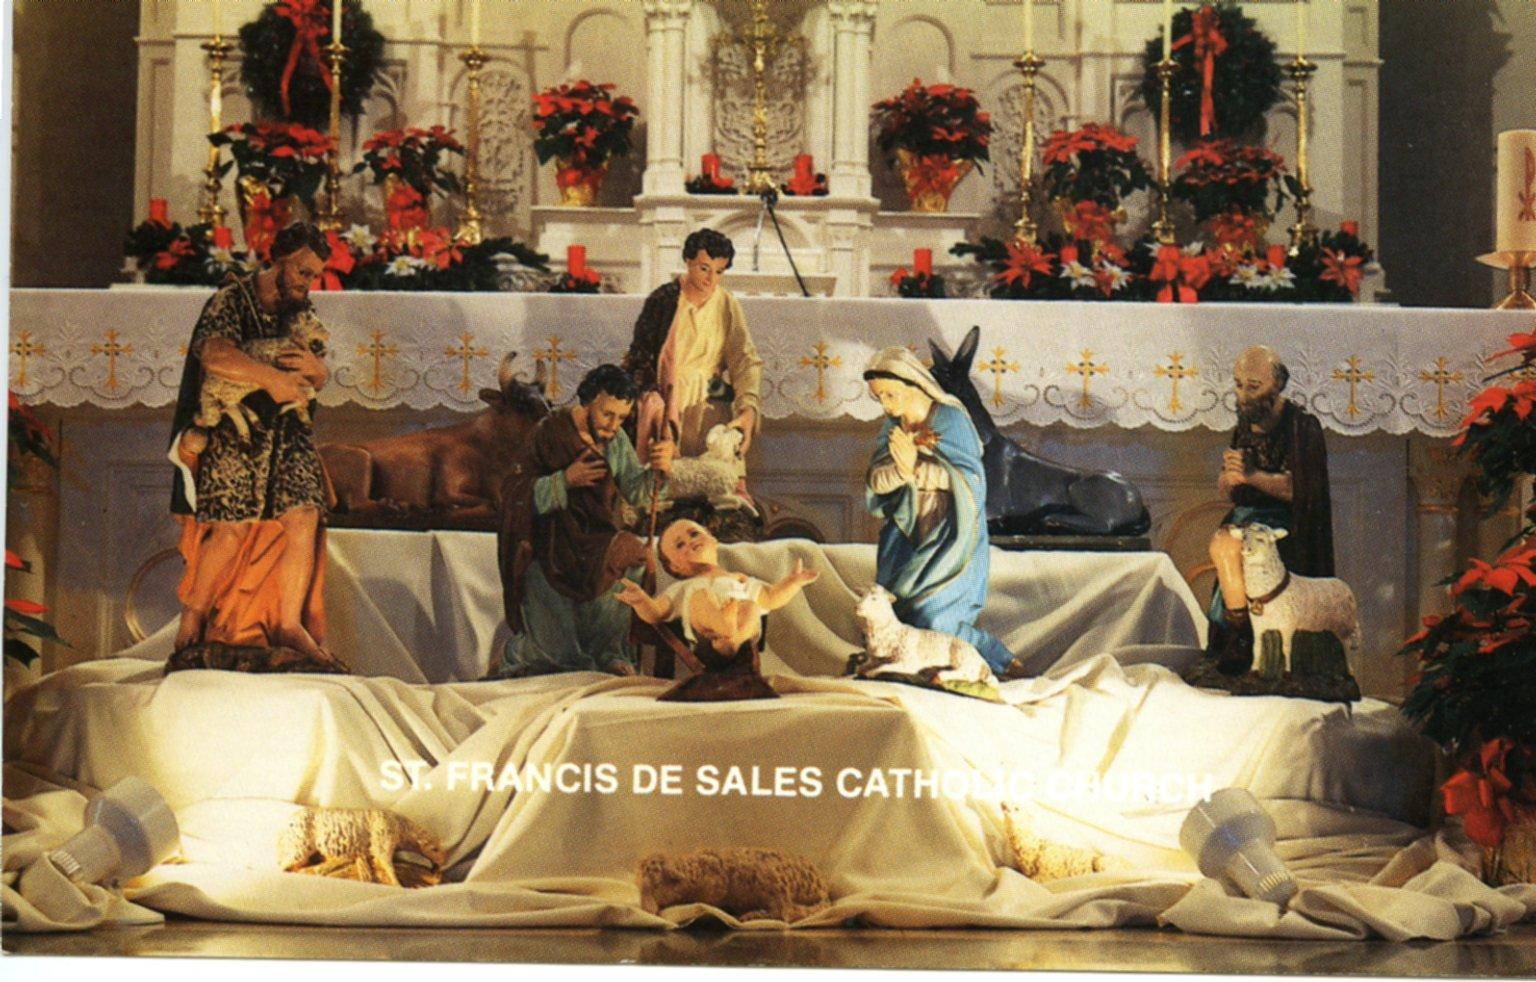 St. Francis de Sales Catholic Church